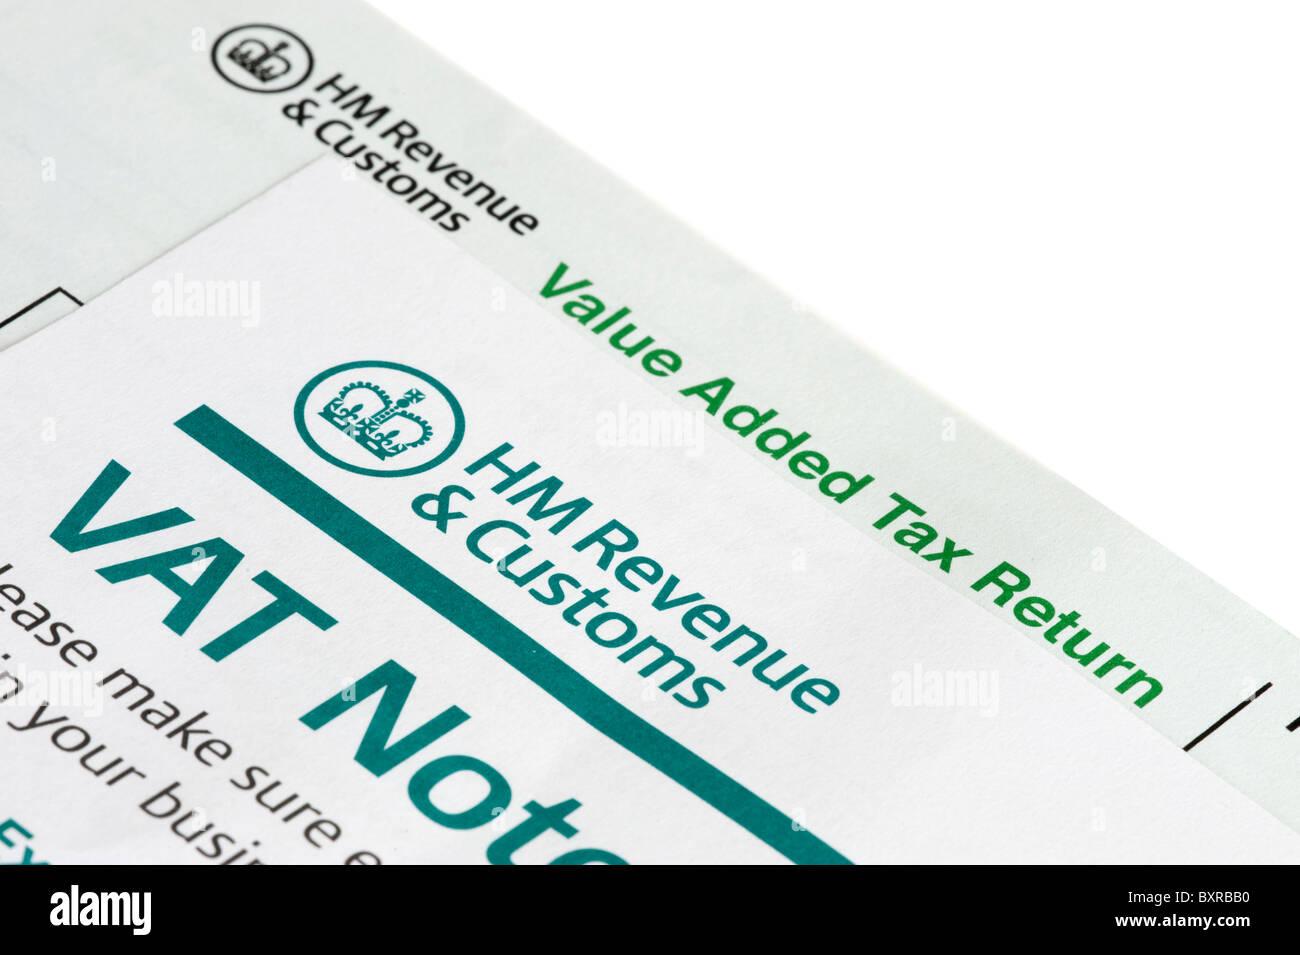 Vat tax return forms. - Stock Image